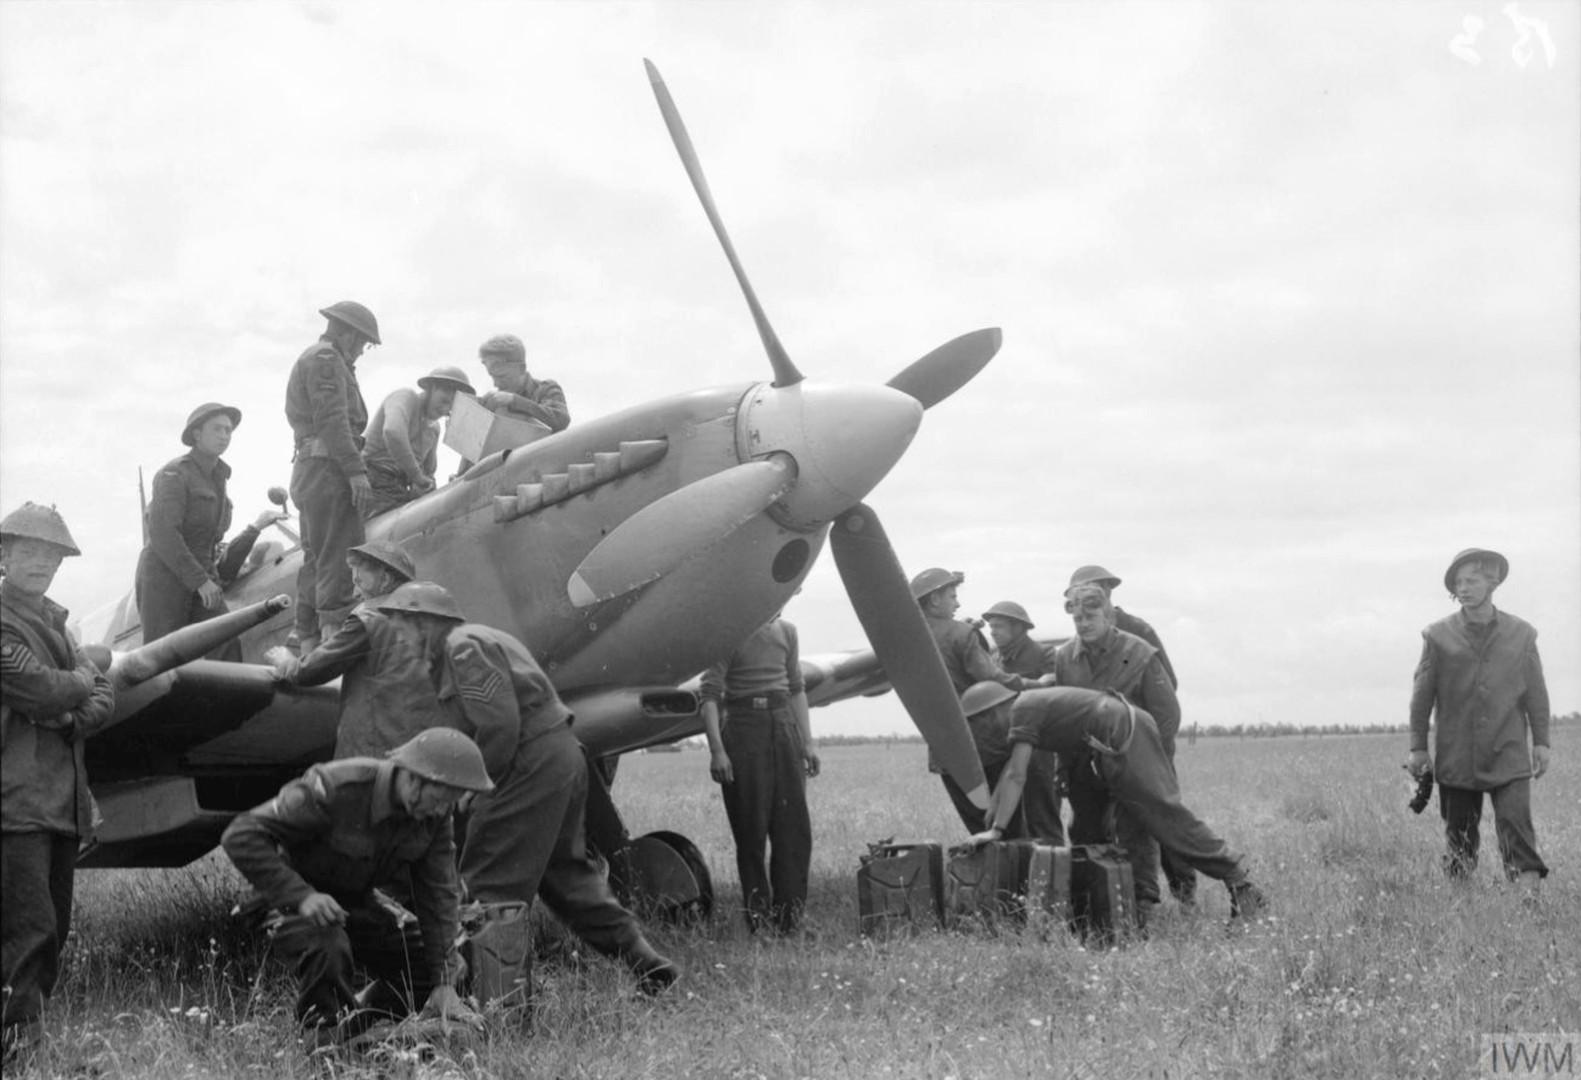 Spitfire at St Croix